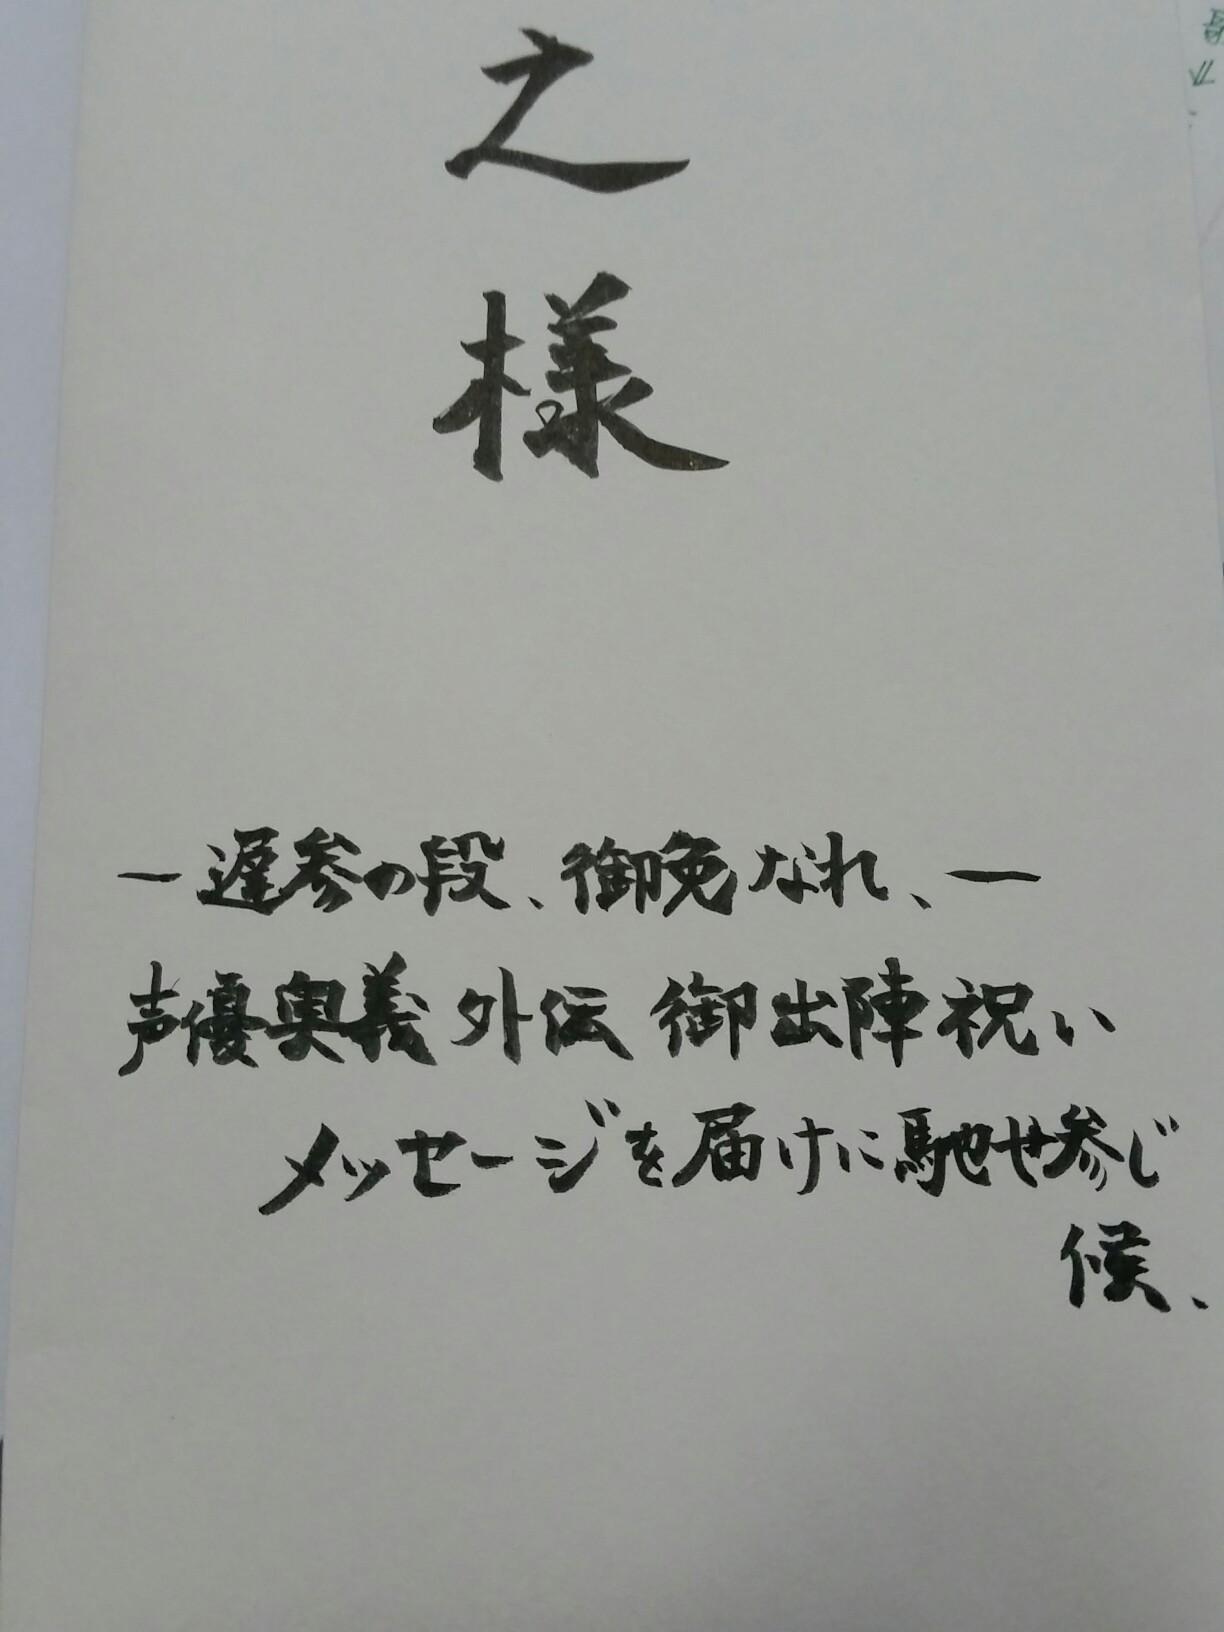 封筒表書き